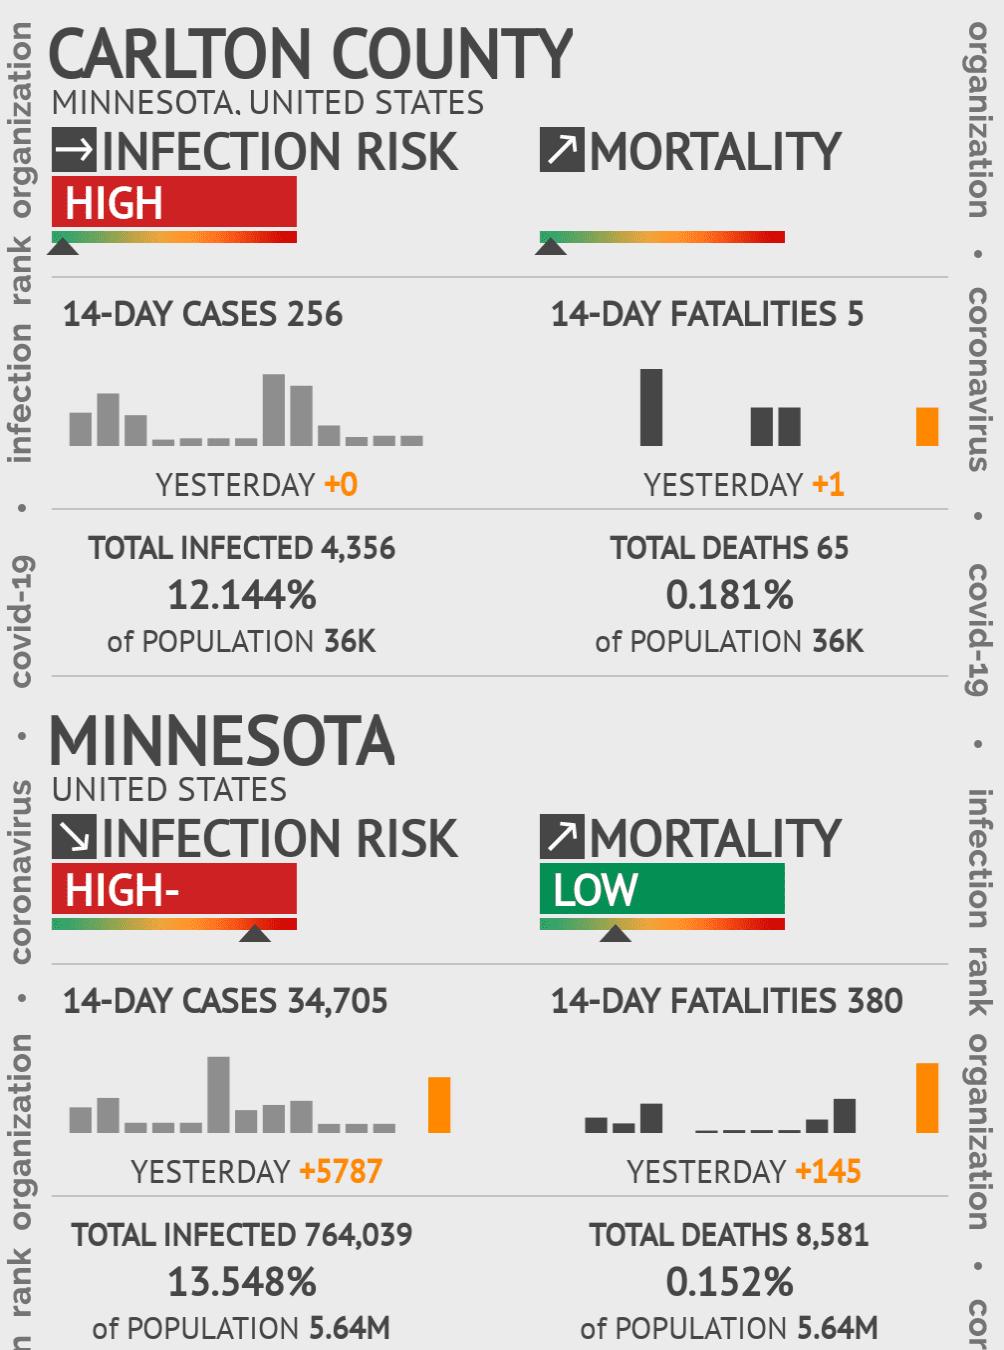 Carlton County Coronavirus Covid-19 Risk of Infection on February 28, 2021